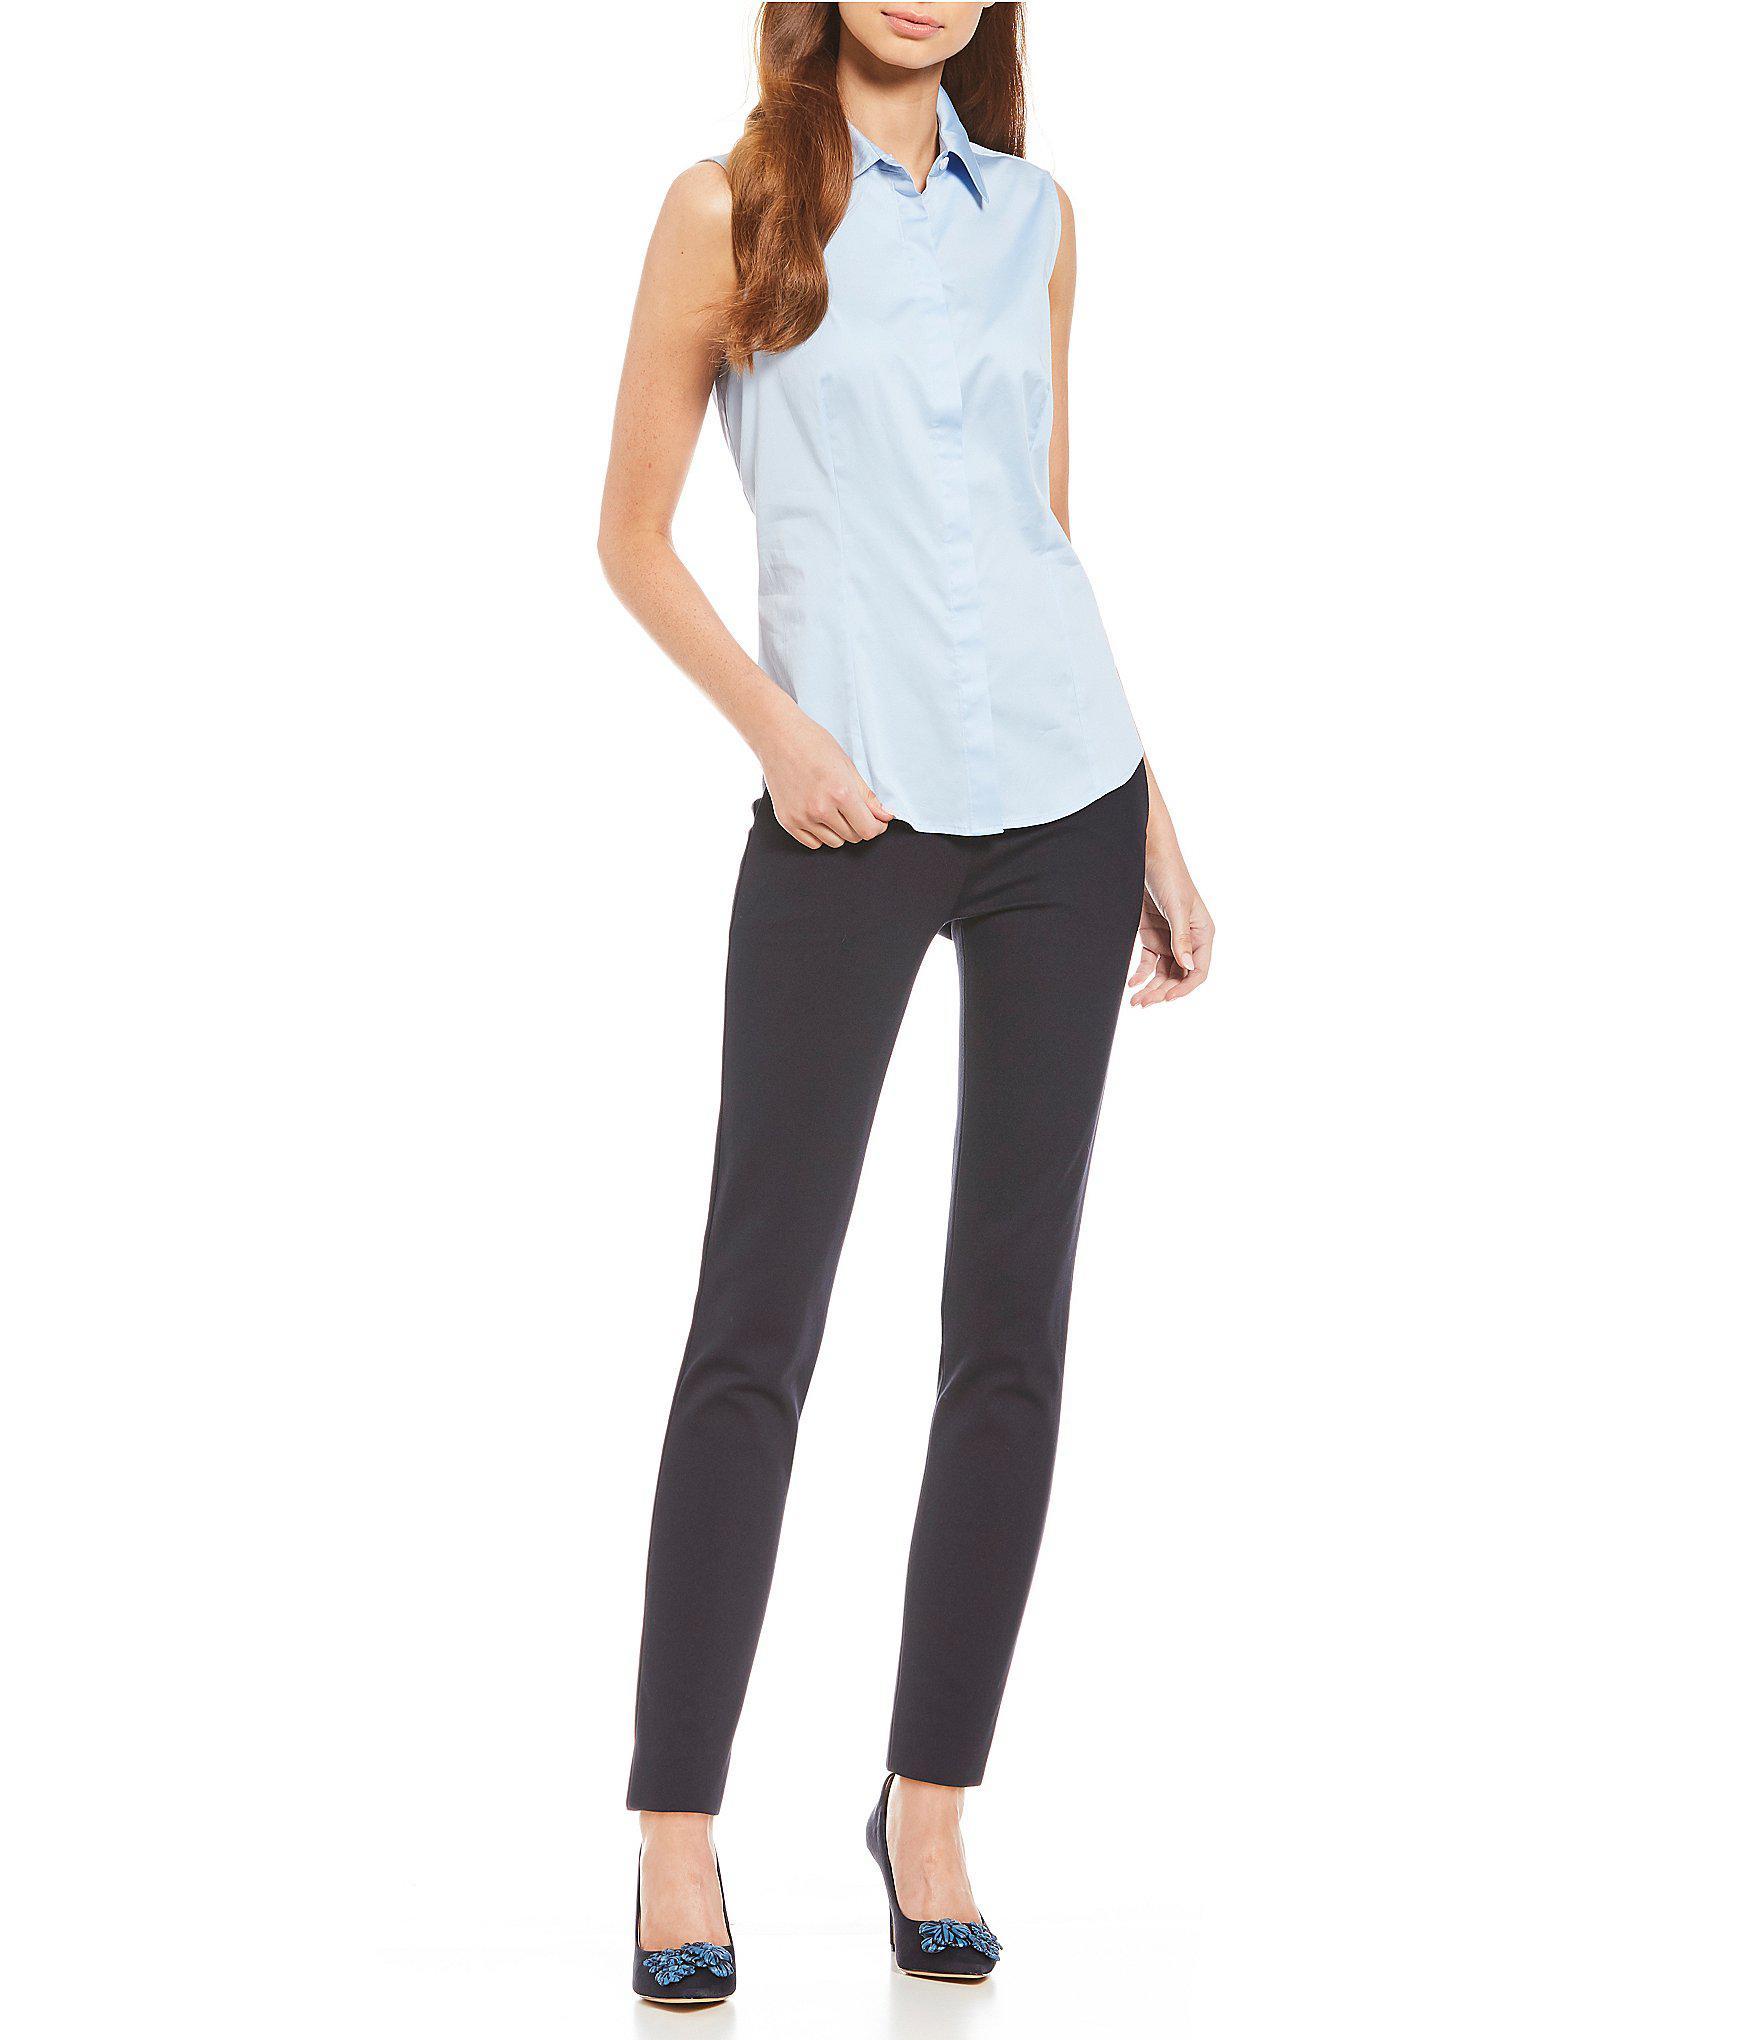 b025b7847a0 Lyst - Antonio Melani Ellie Button Front Sleeveless Blouse in Blue